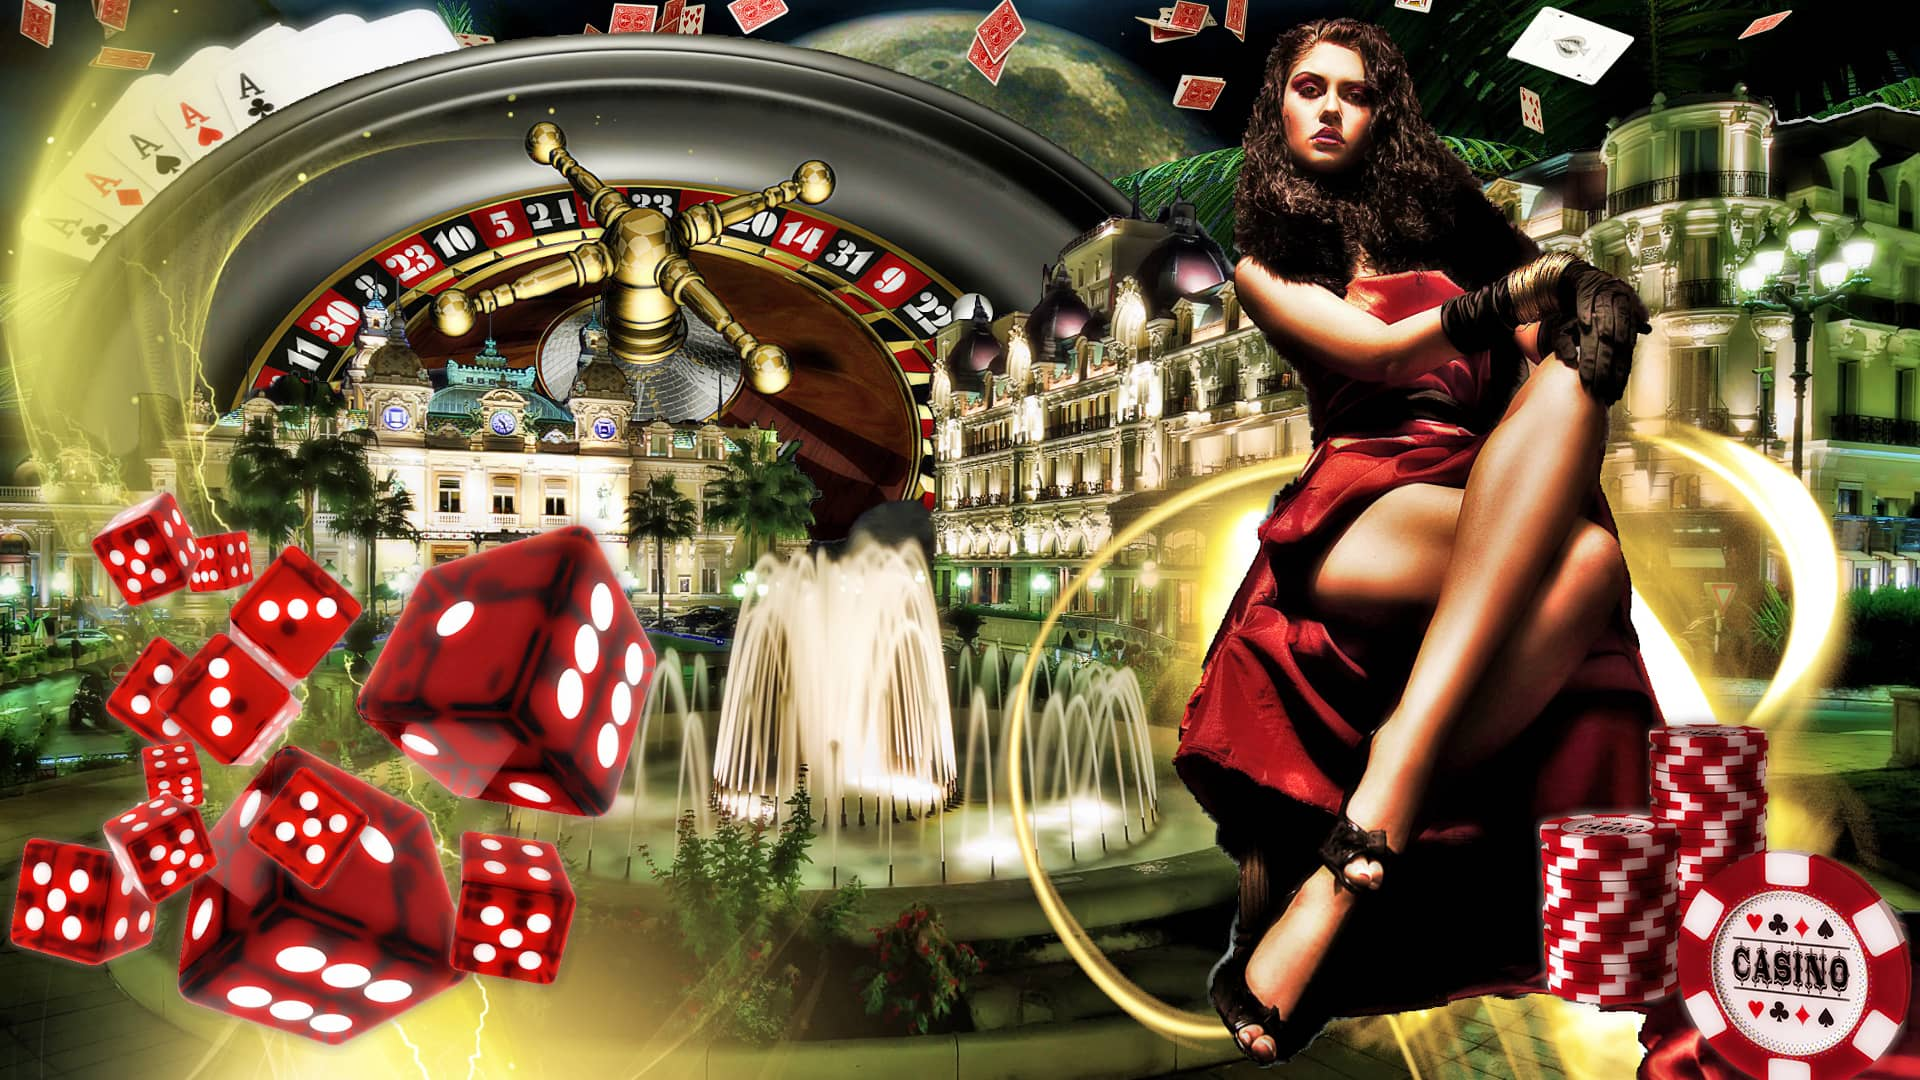 Indonesia, Thailand, Combodia & Korian - Unique1000 PBN, DA 30+ Casino, Poker, Gambling sites